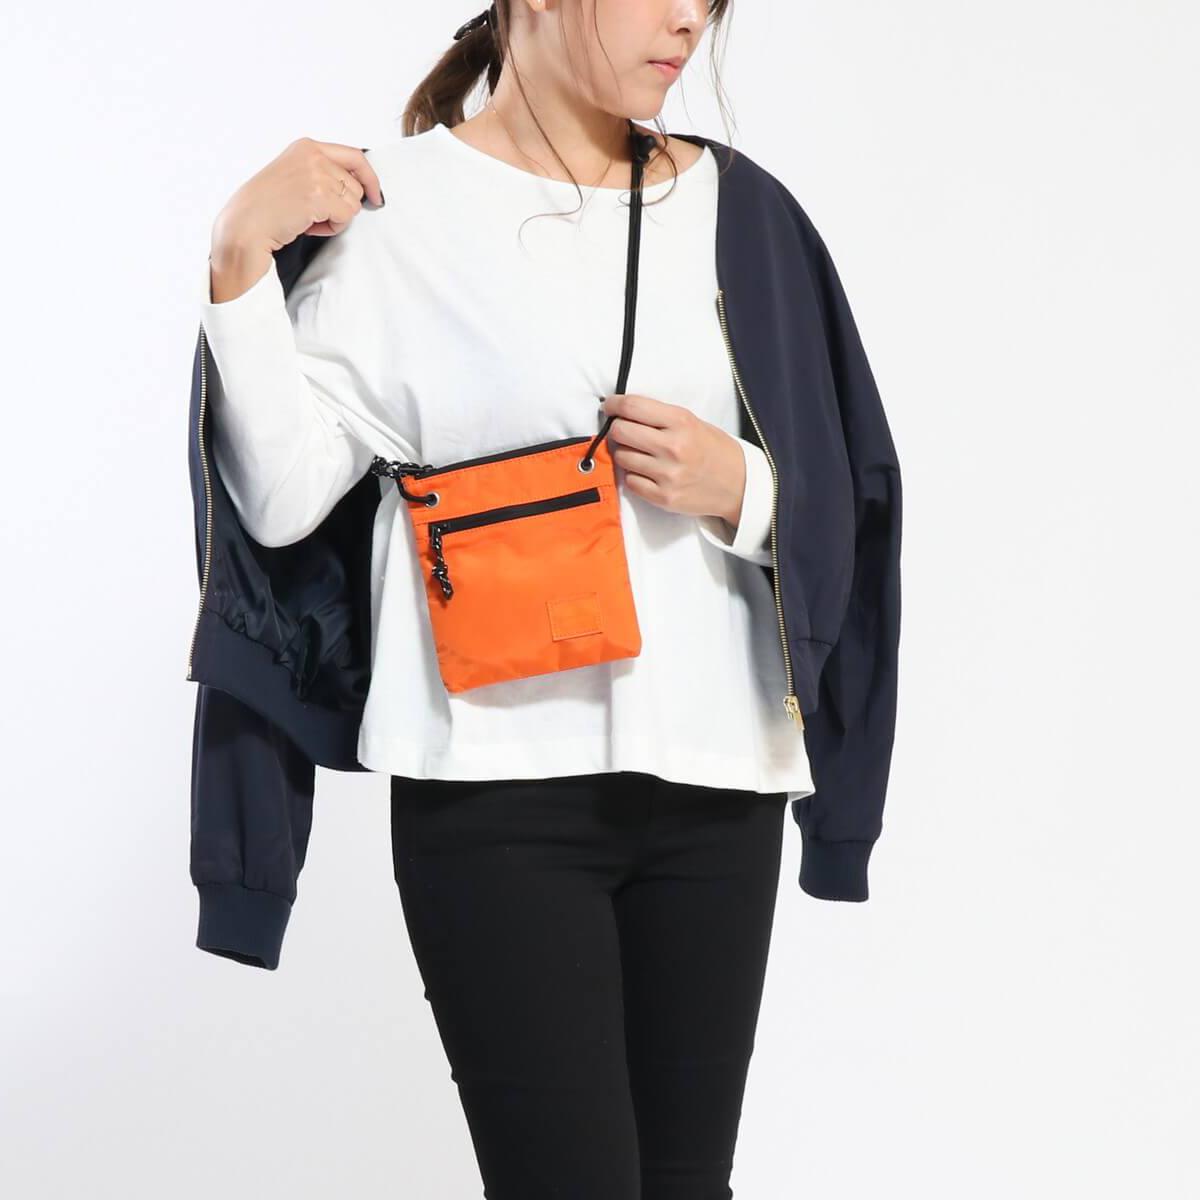 b6c0691e5 ... Herschel Supply Sacoche ALDER MINI Shoulder bag compact men's ladies  10512 ...